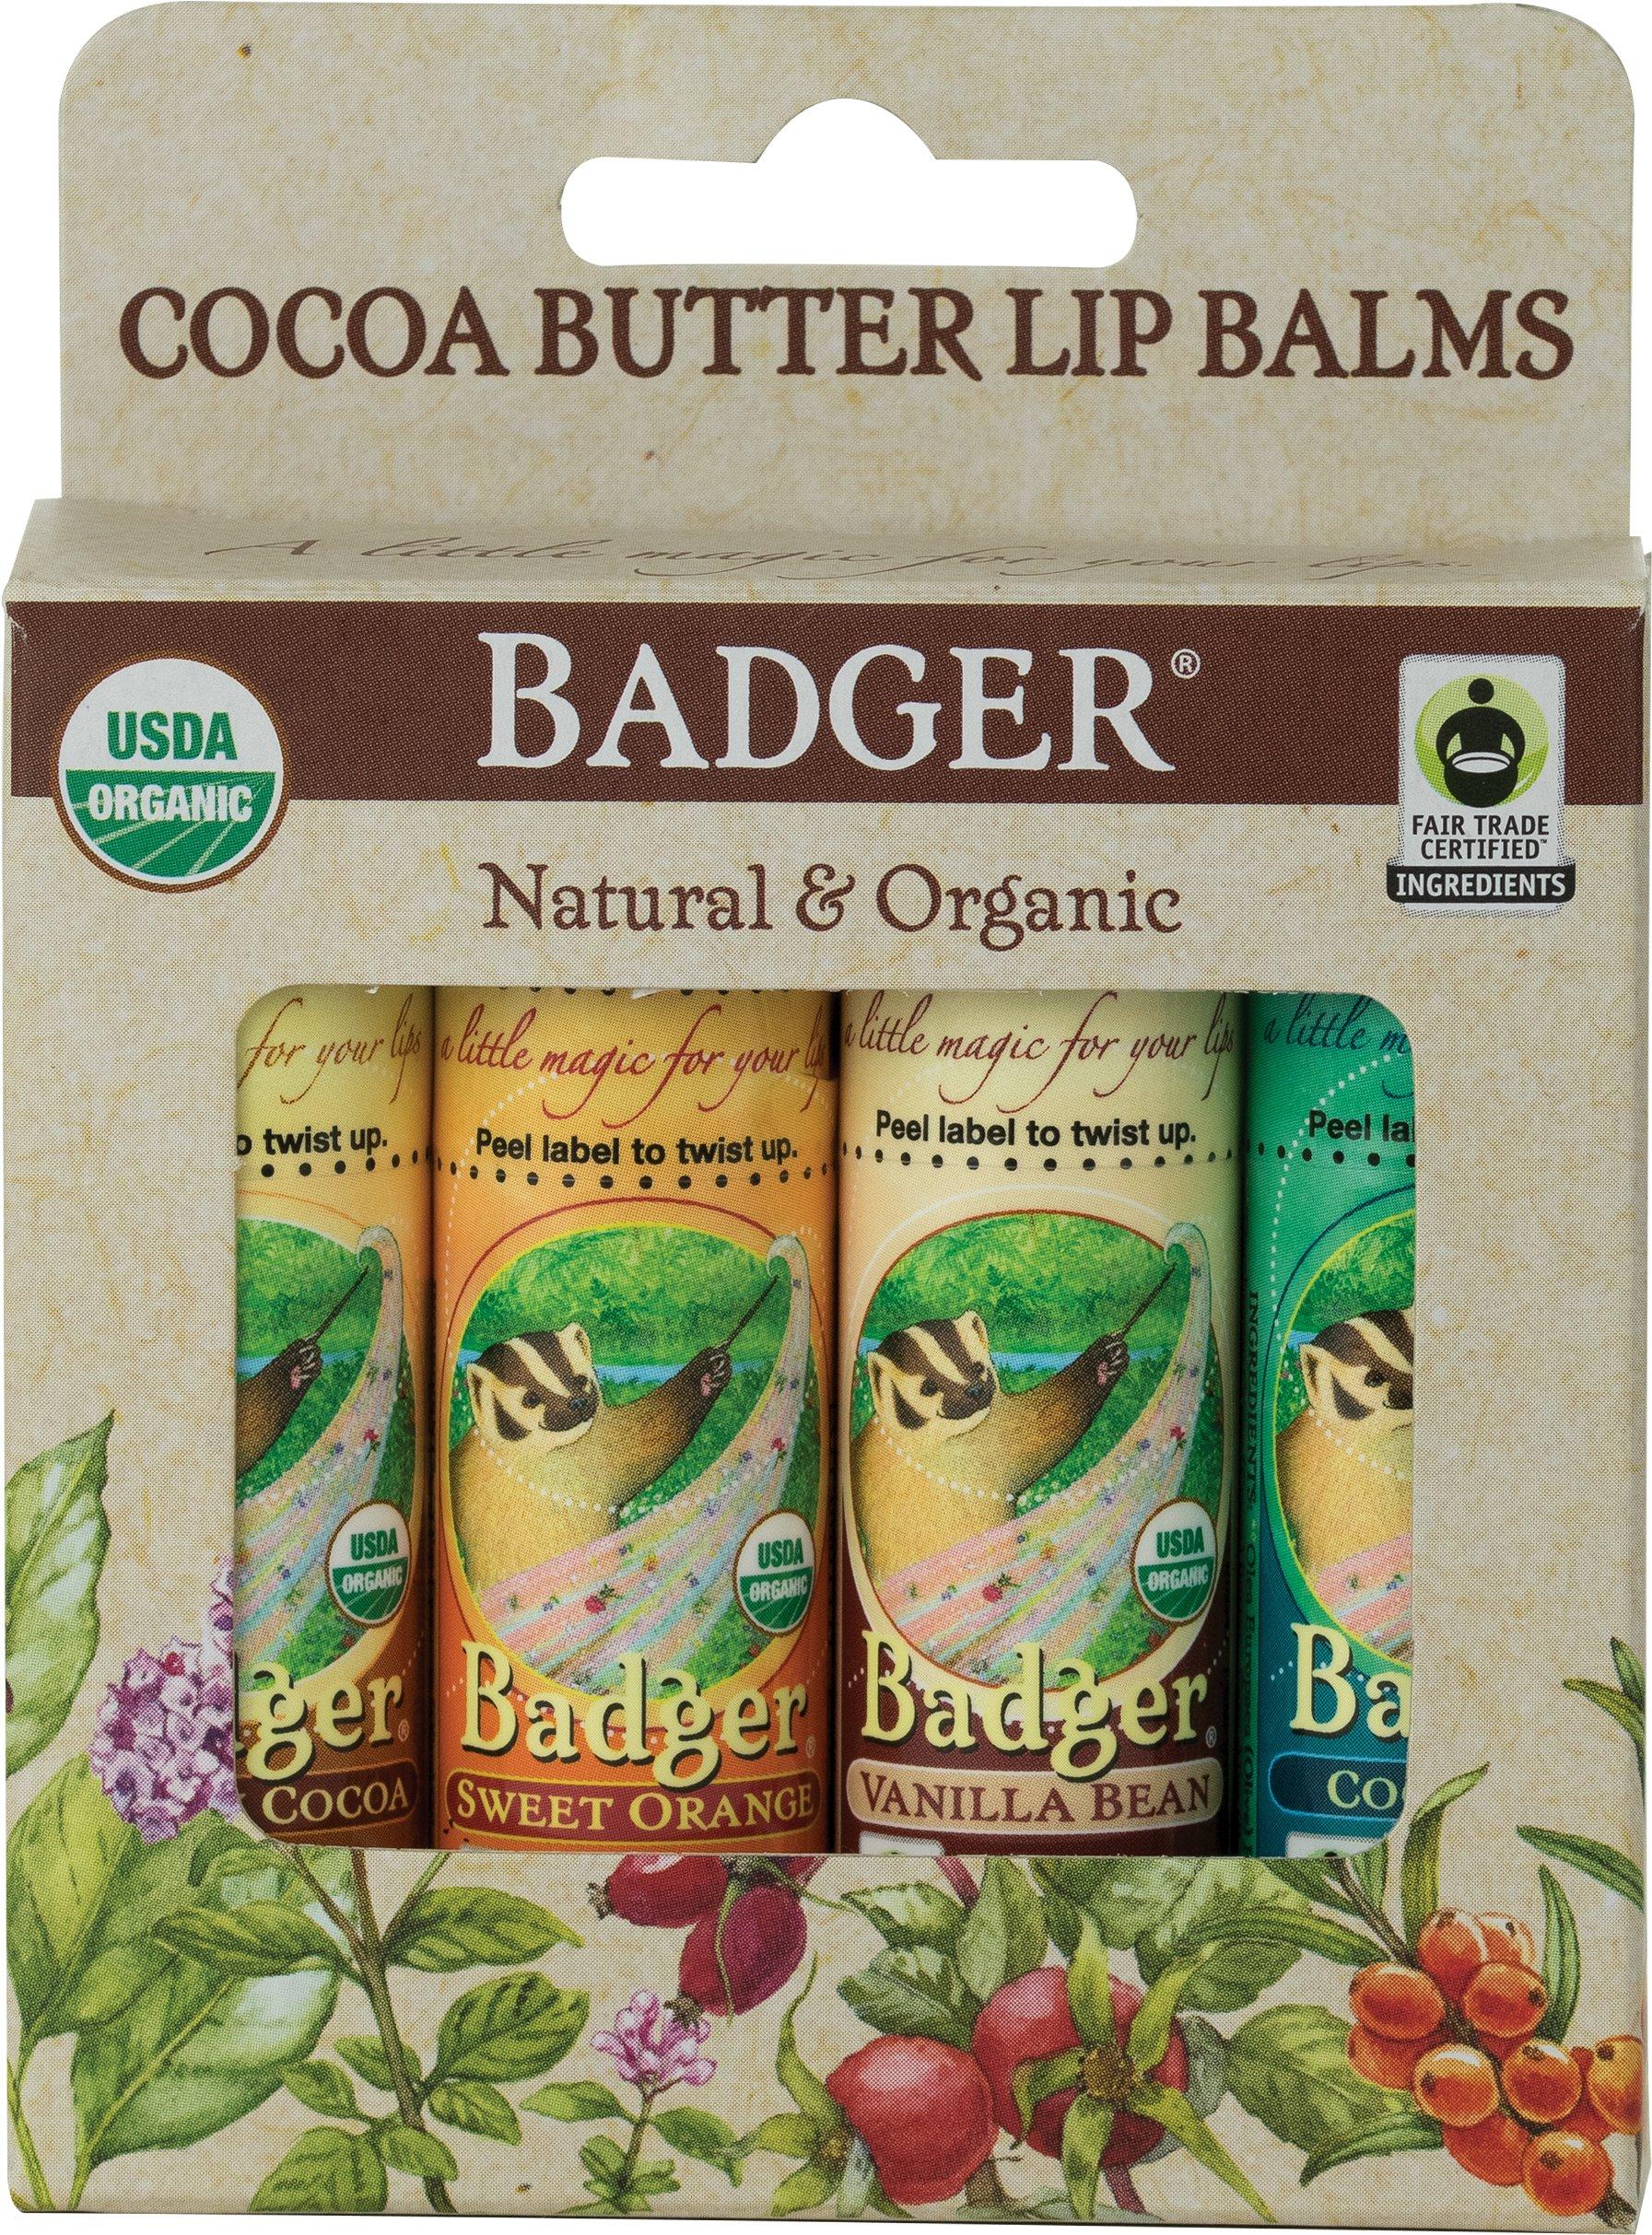 Badger Fair Trade Cocoa Butter Lip Balm - 4 Pack by Badger